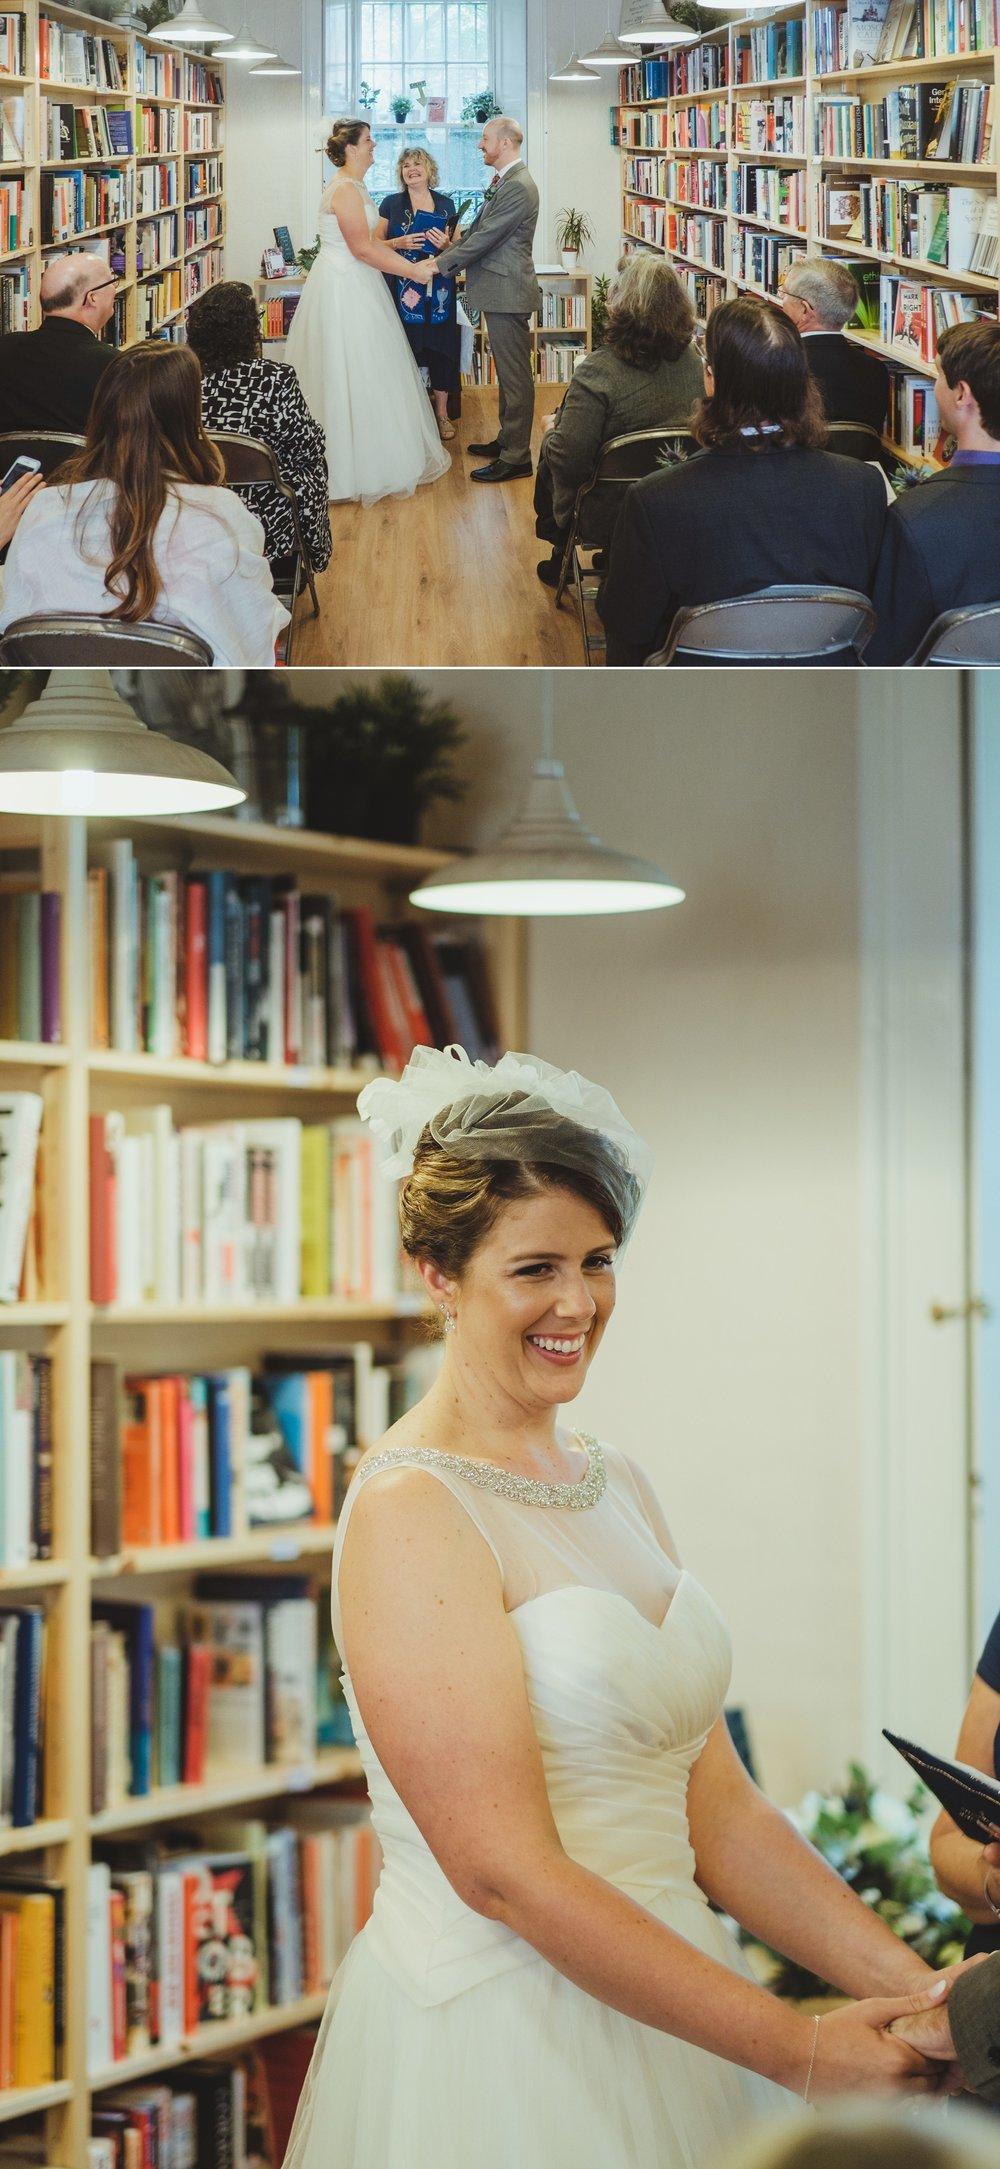 Angela___Andy_s_Edinburgh_elopement_by_Barry_Forshaw_0124.jpg